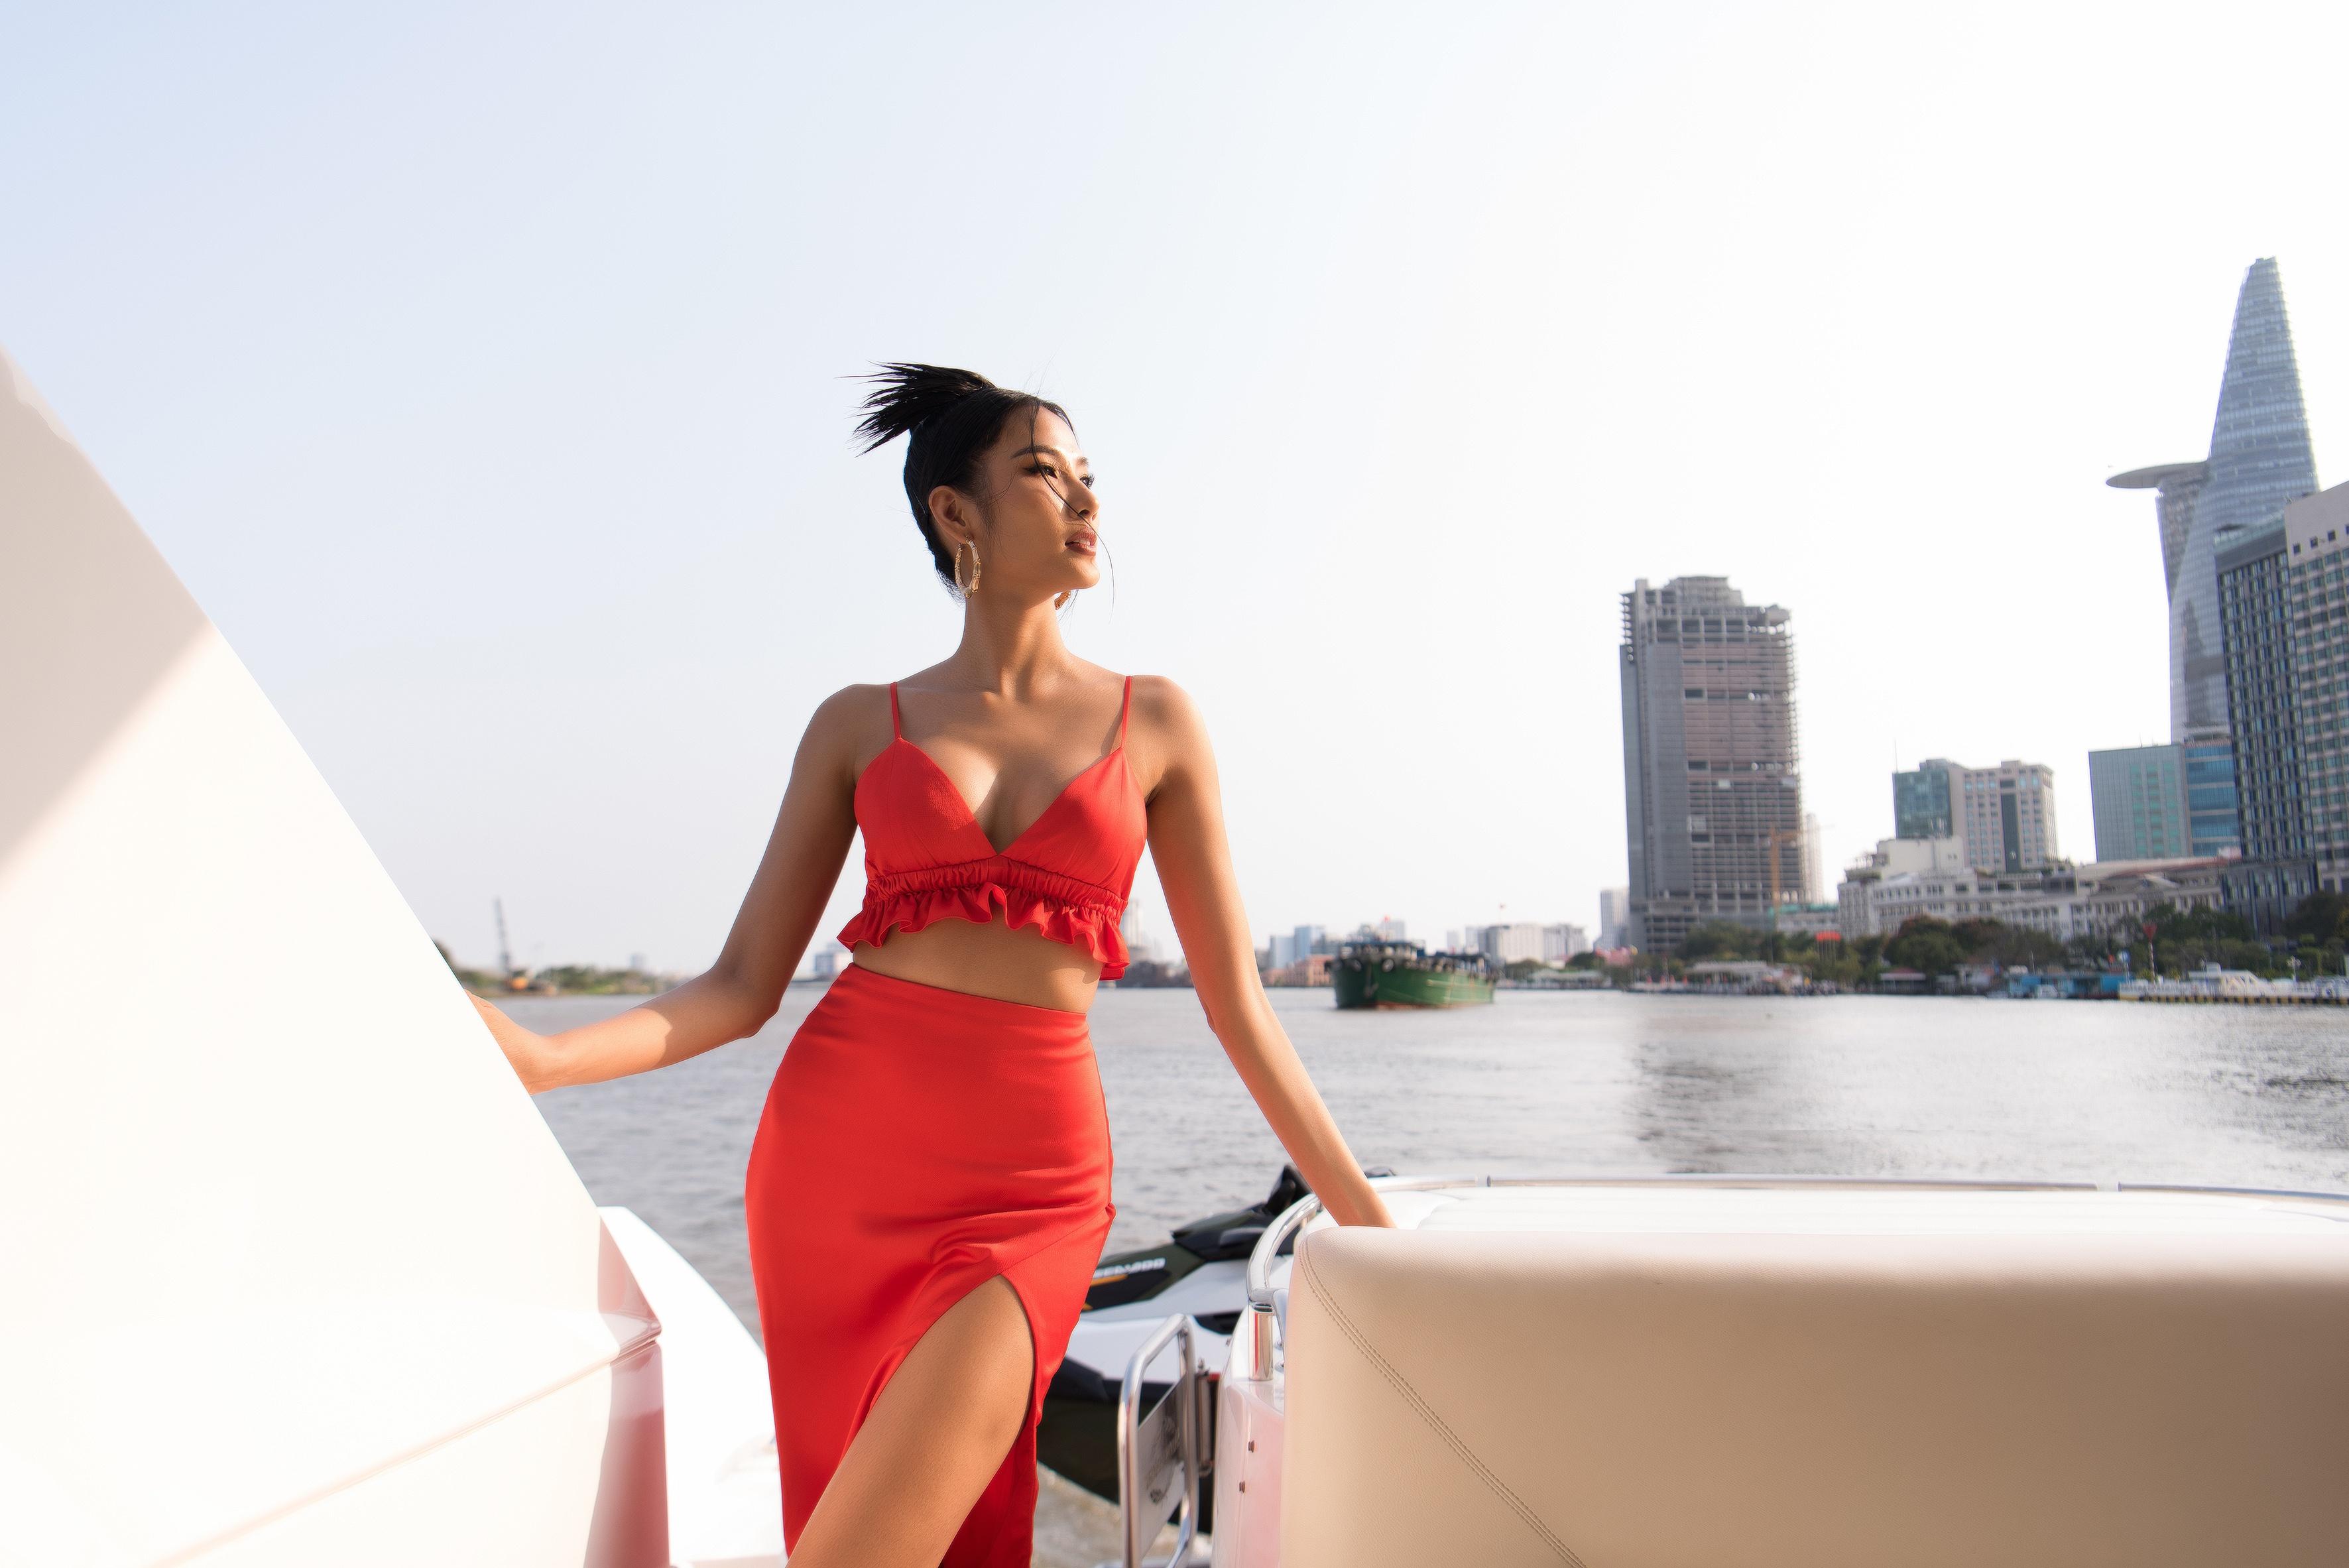 Hoa hau Sieu Quoc gia 2019 o Viet Nam 8 nam hinh anh 7 Miss_Universe_Viet_Nam_2019_Hoang_Thuy..jpg